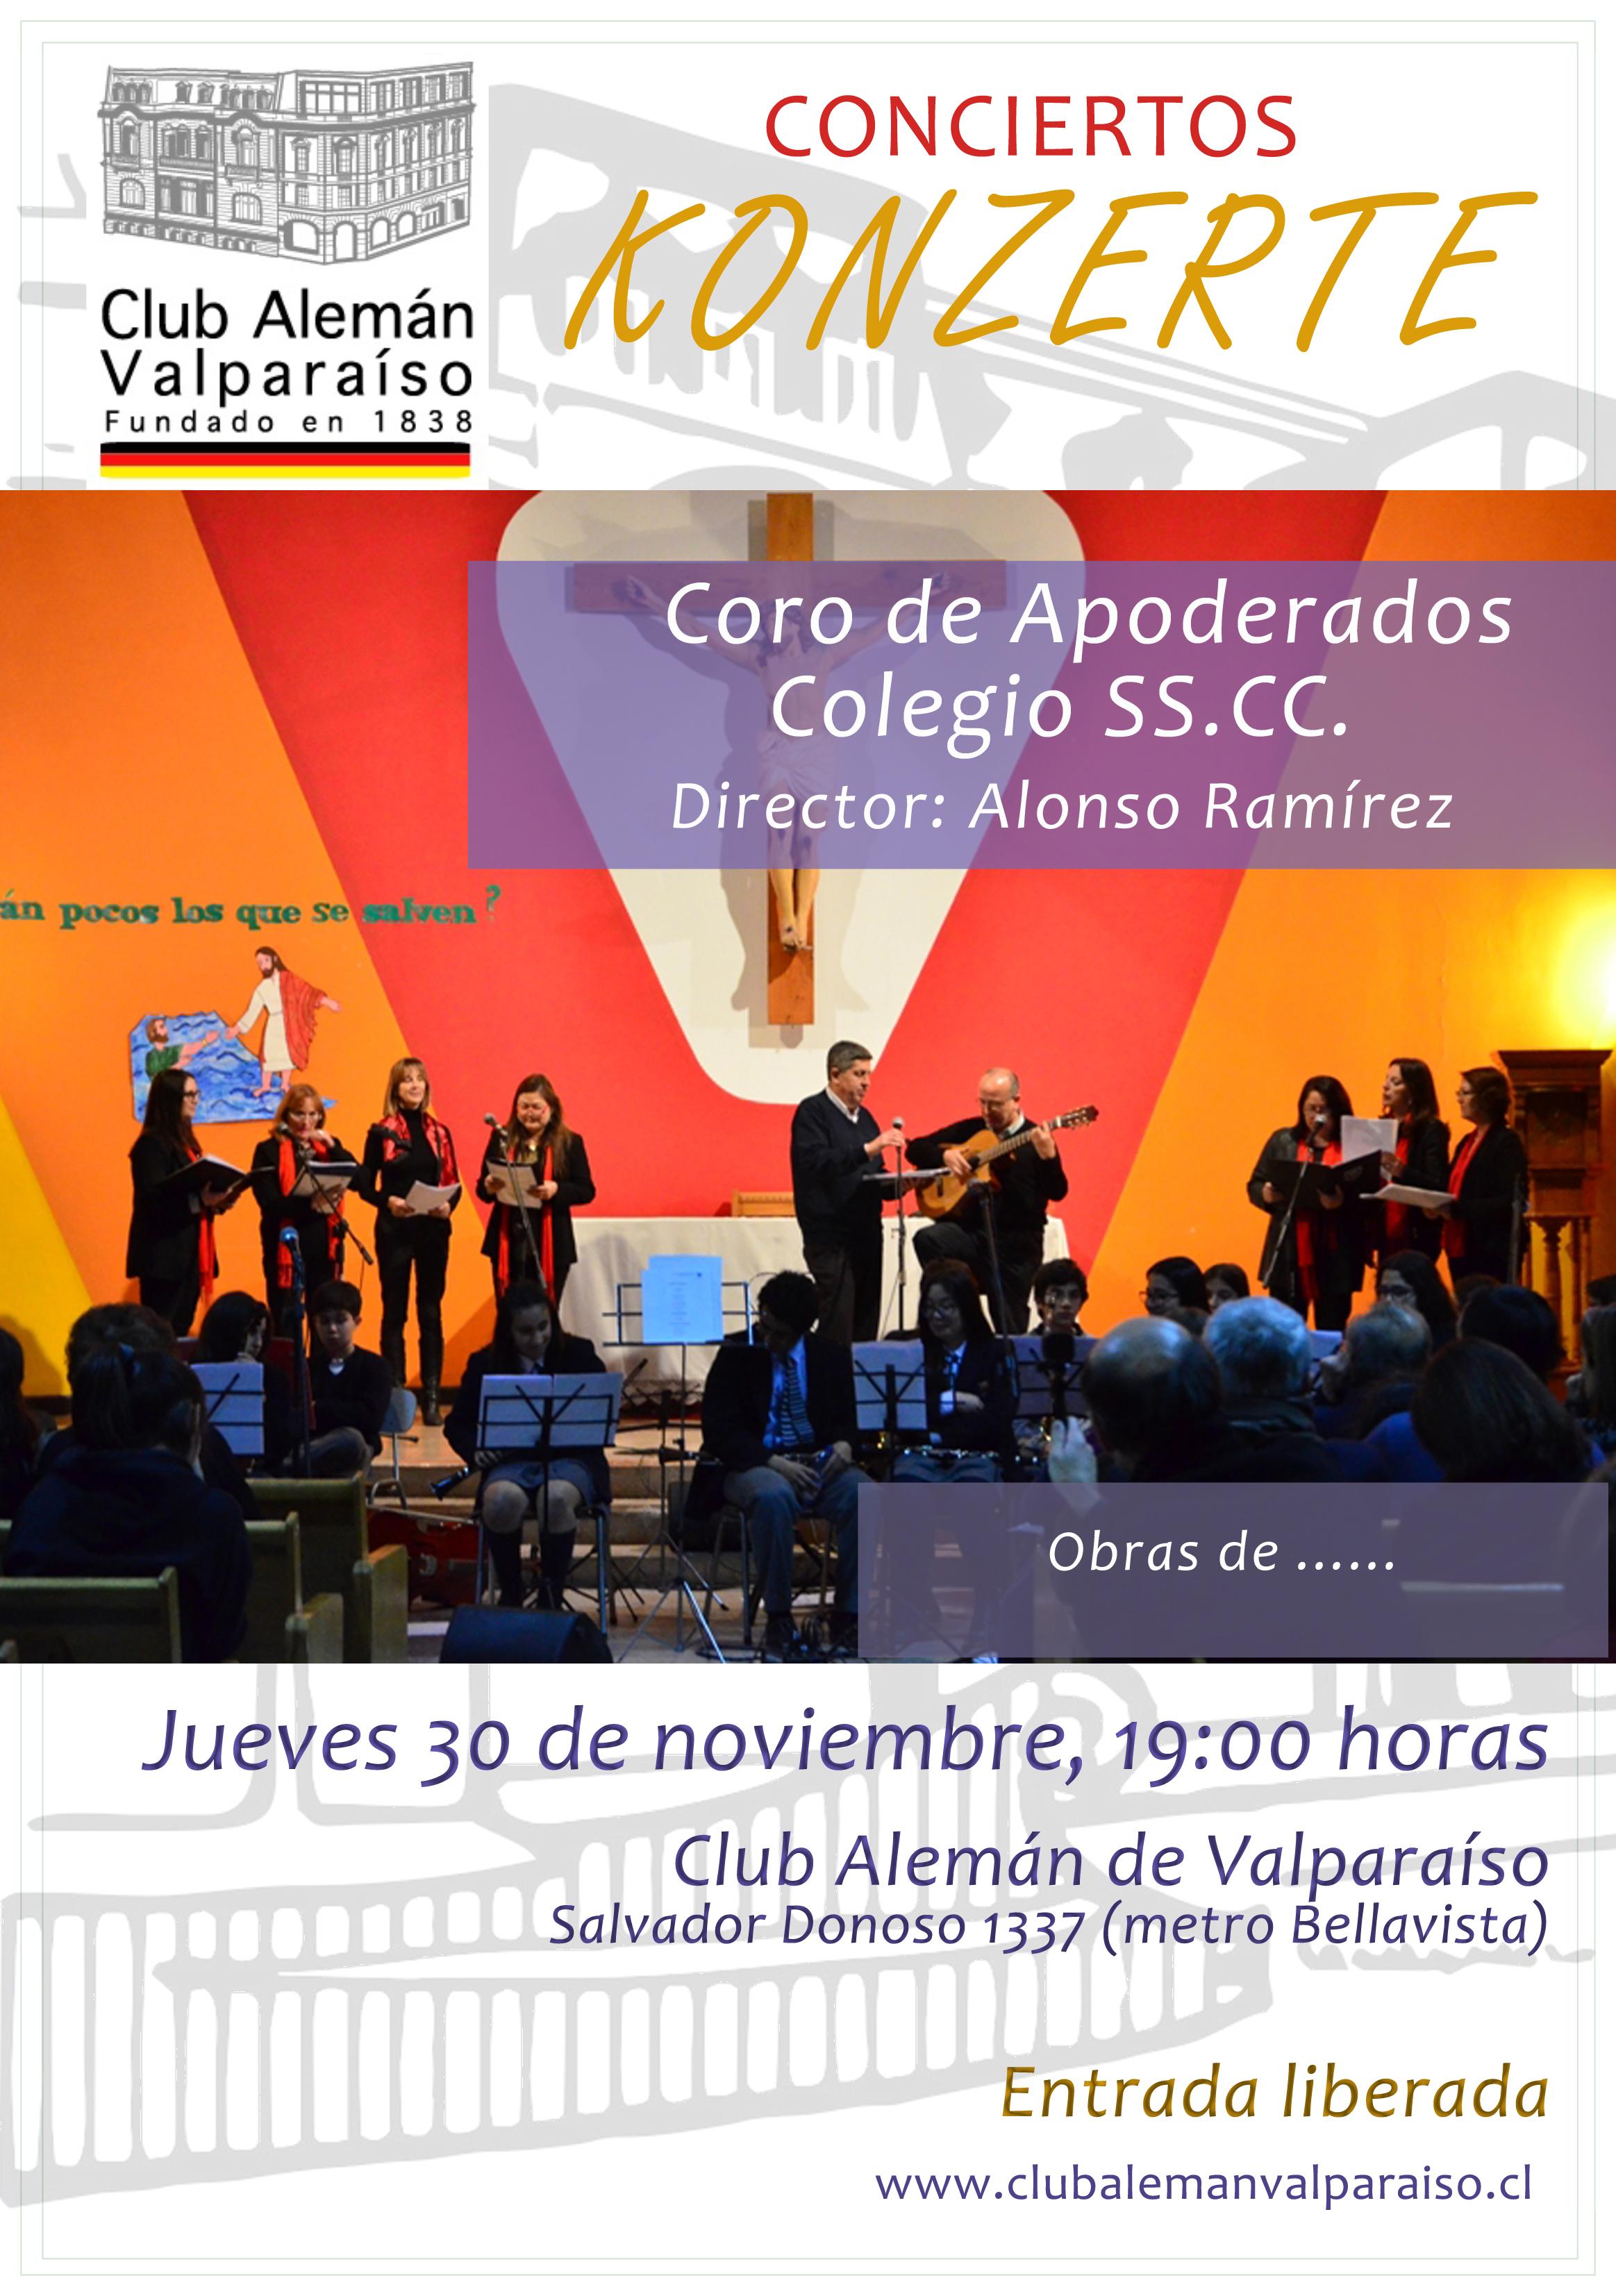 Afiche concierto Coro Apoderados SSCC